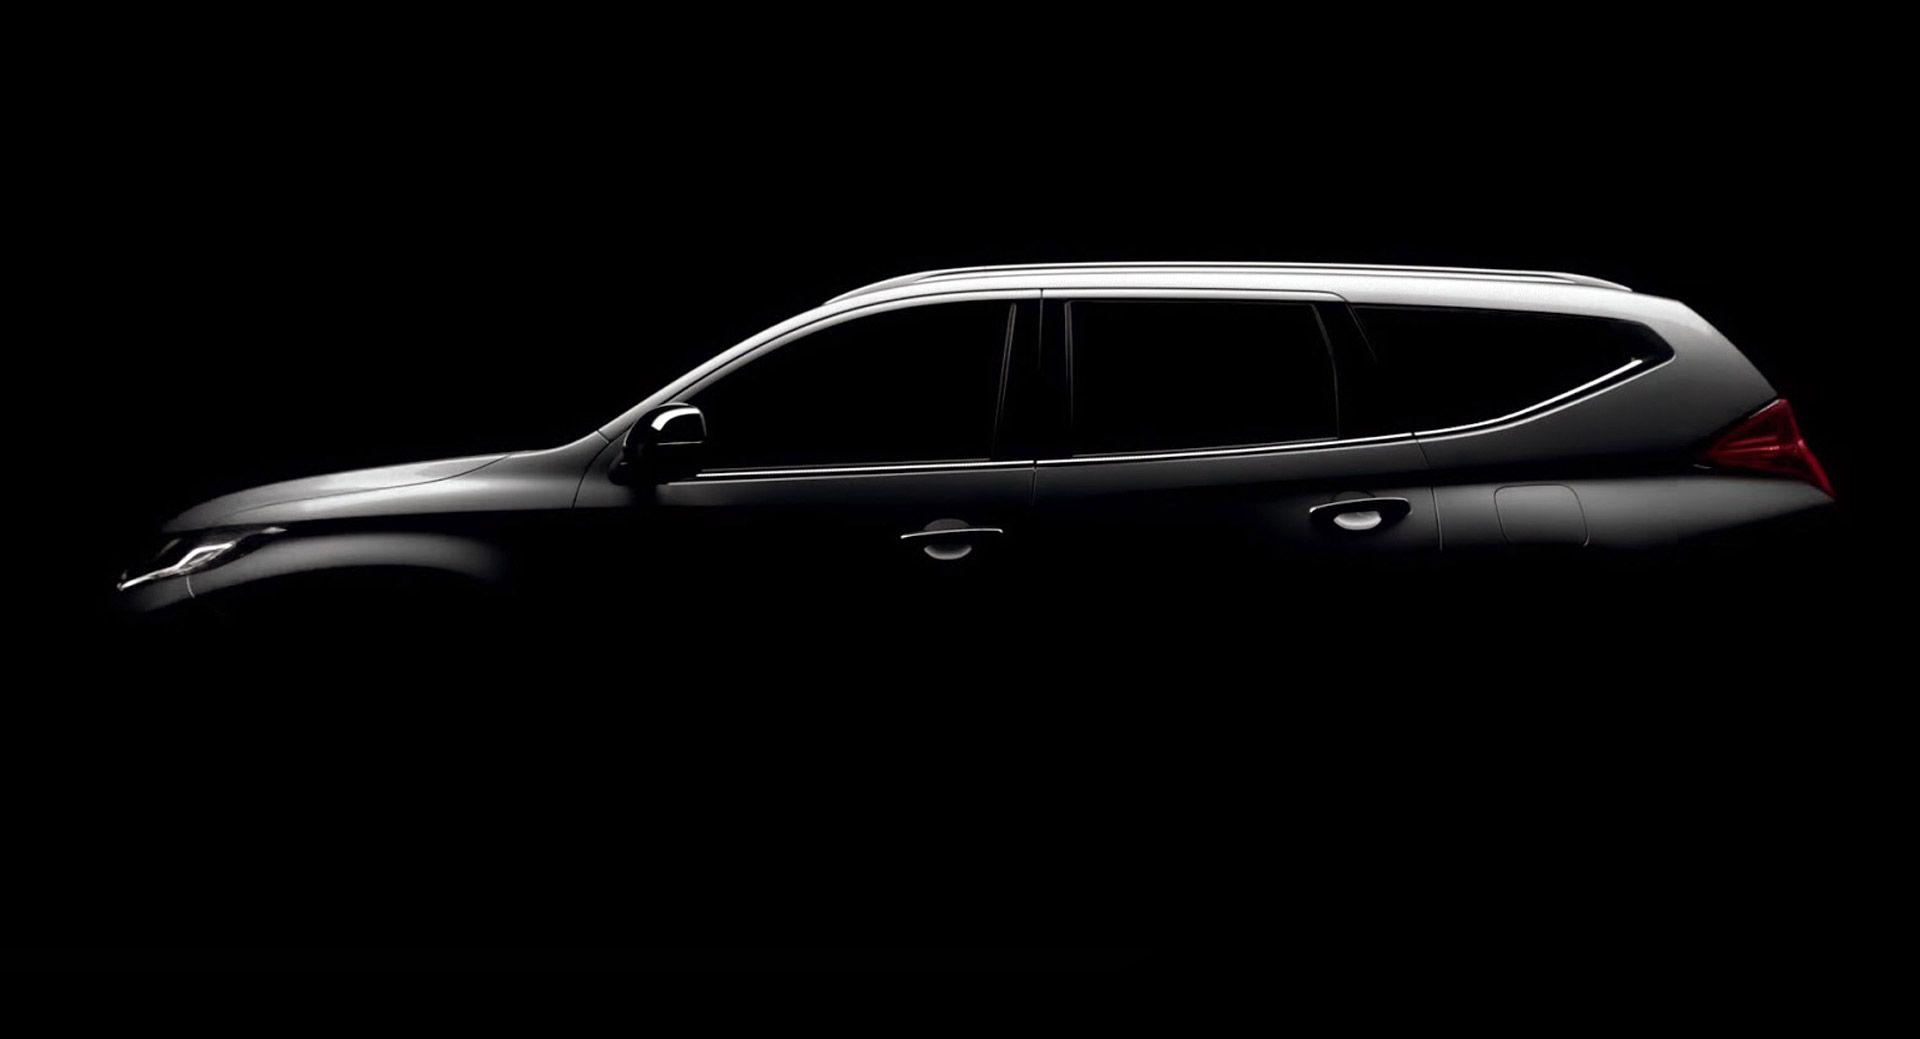 2017 Mitsubishi Montero Sport Teased In New Video Kendaraan